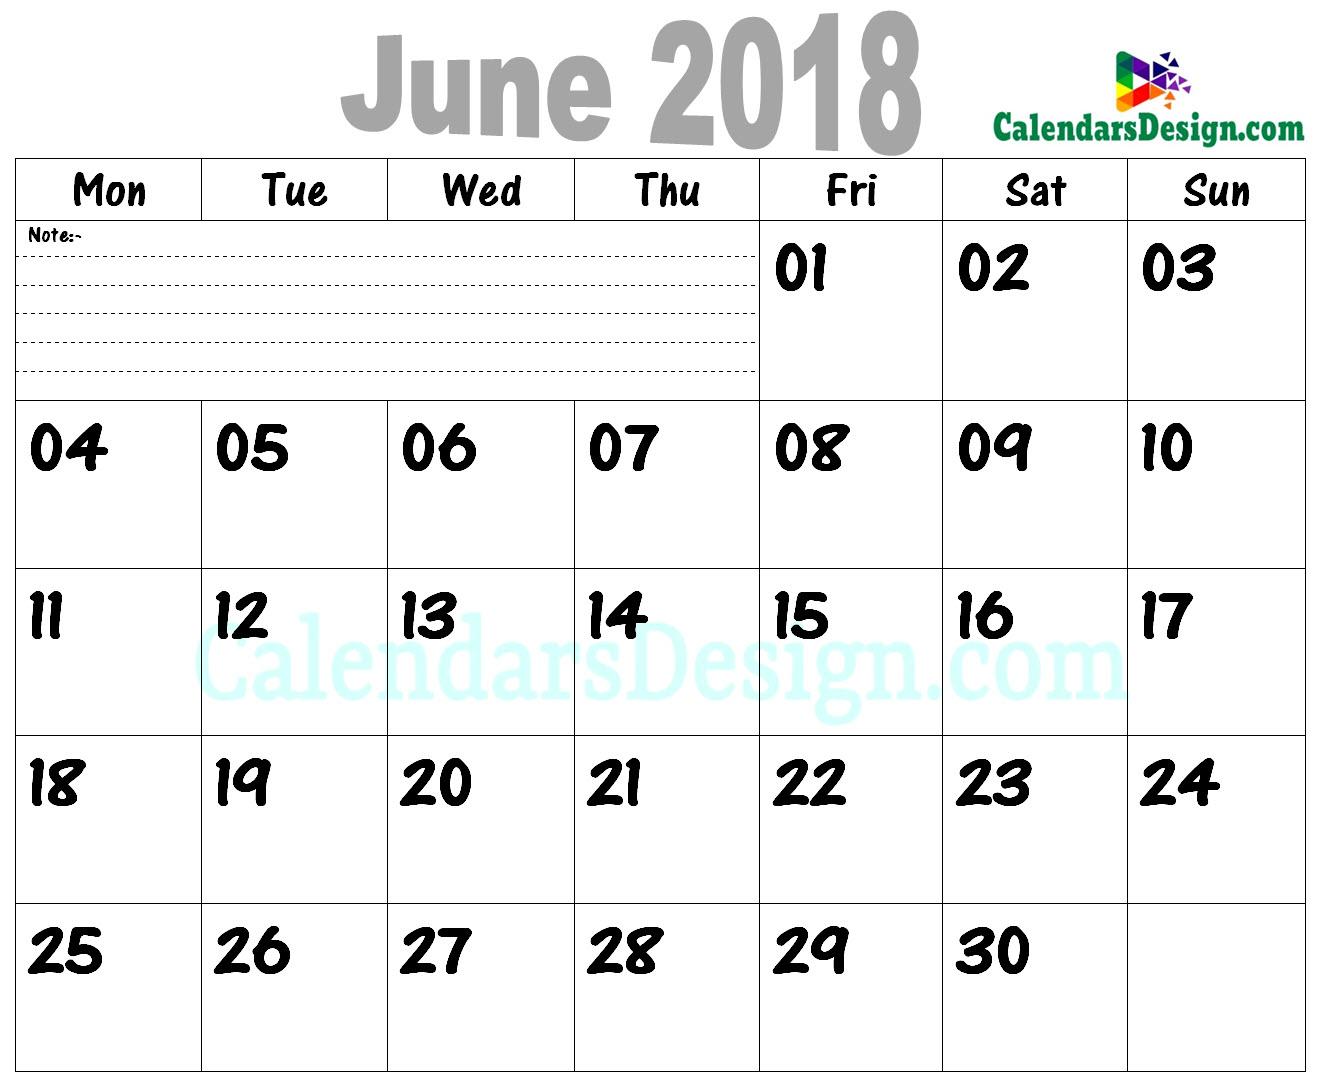 June 2018 Calendar PDF